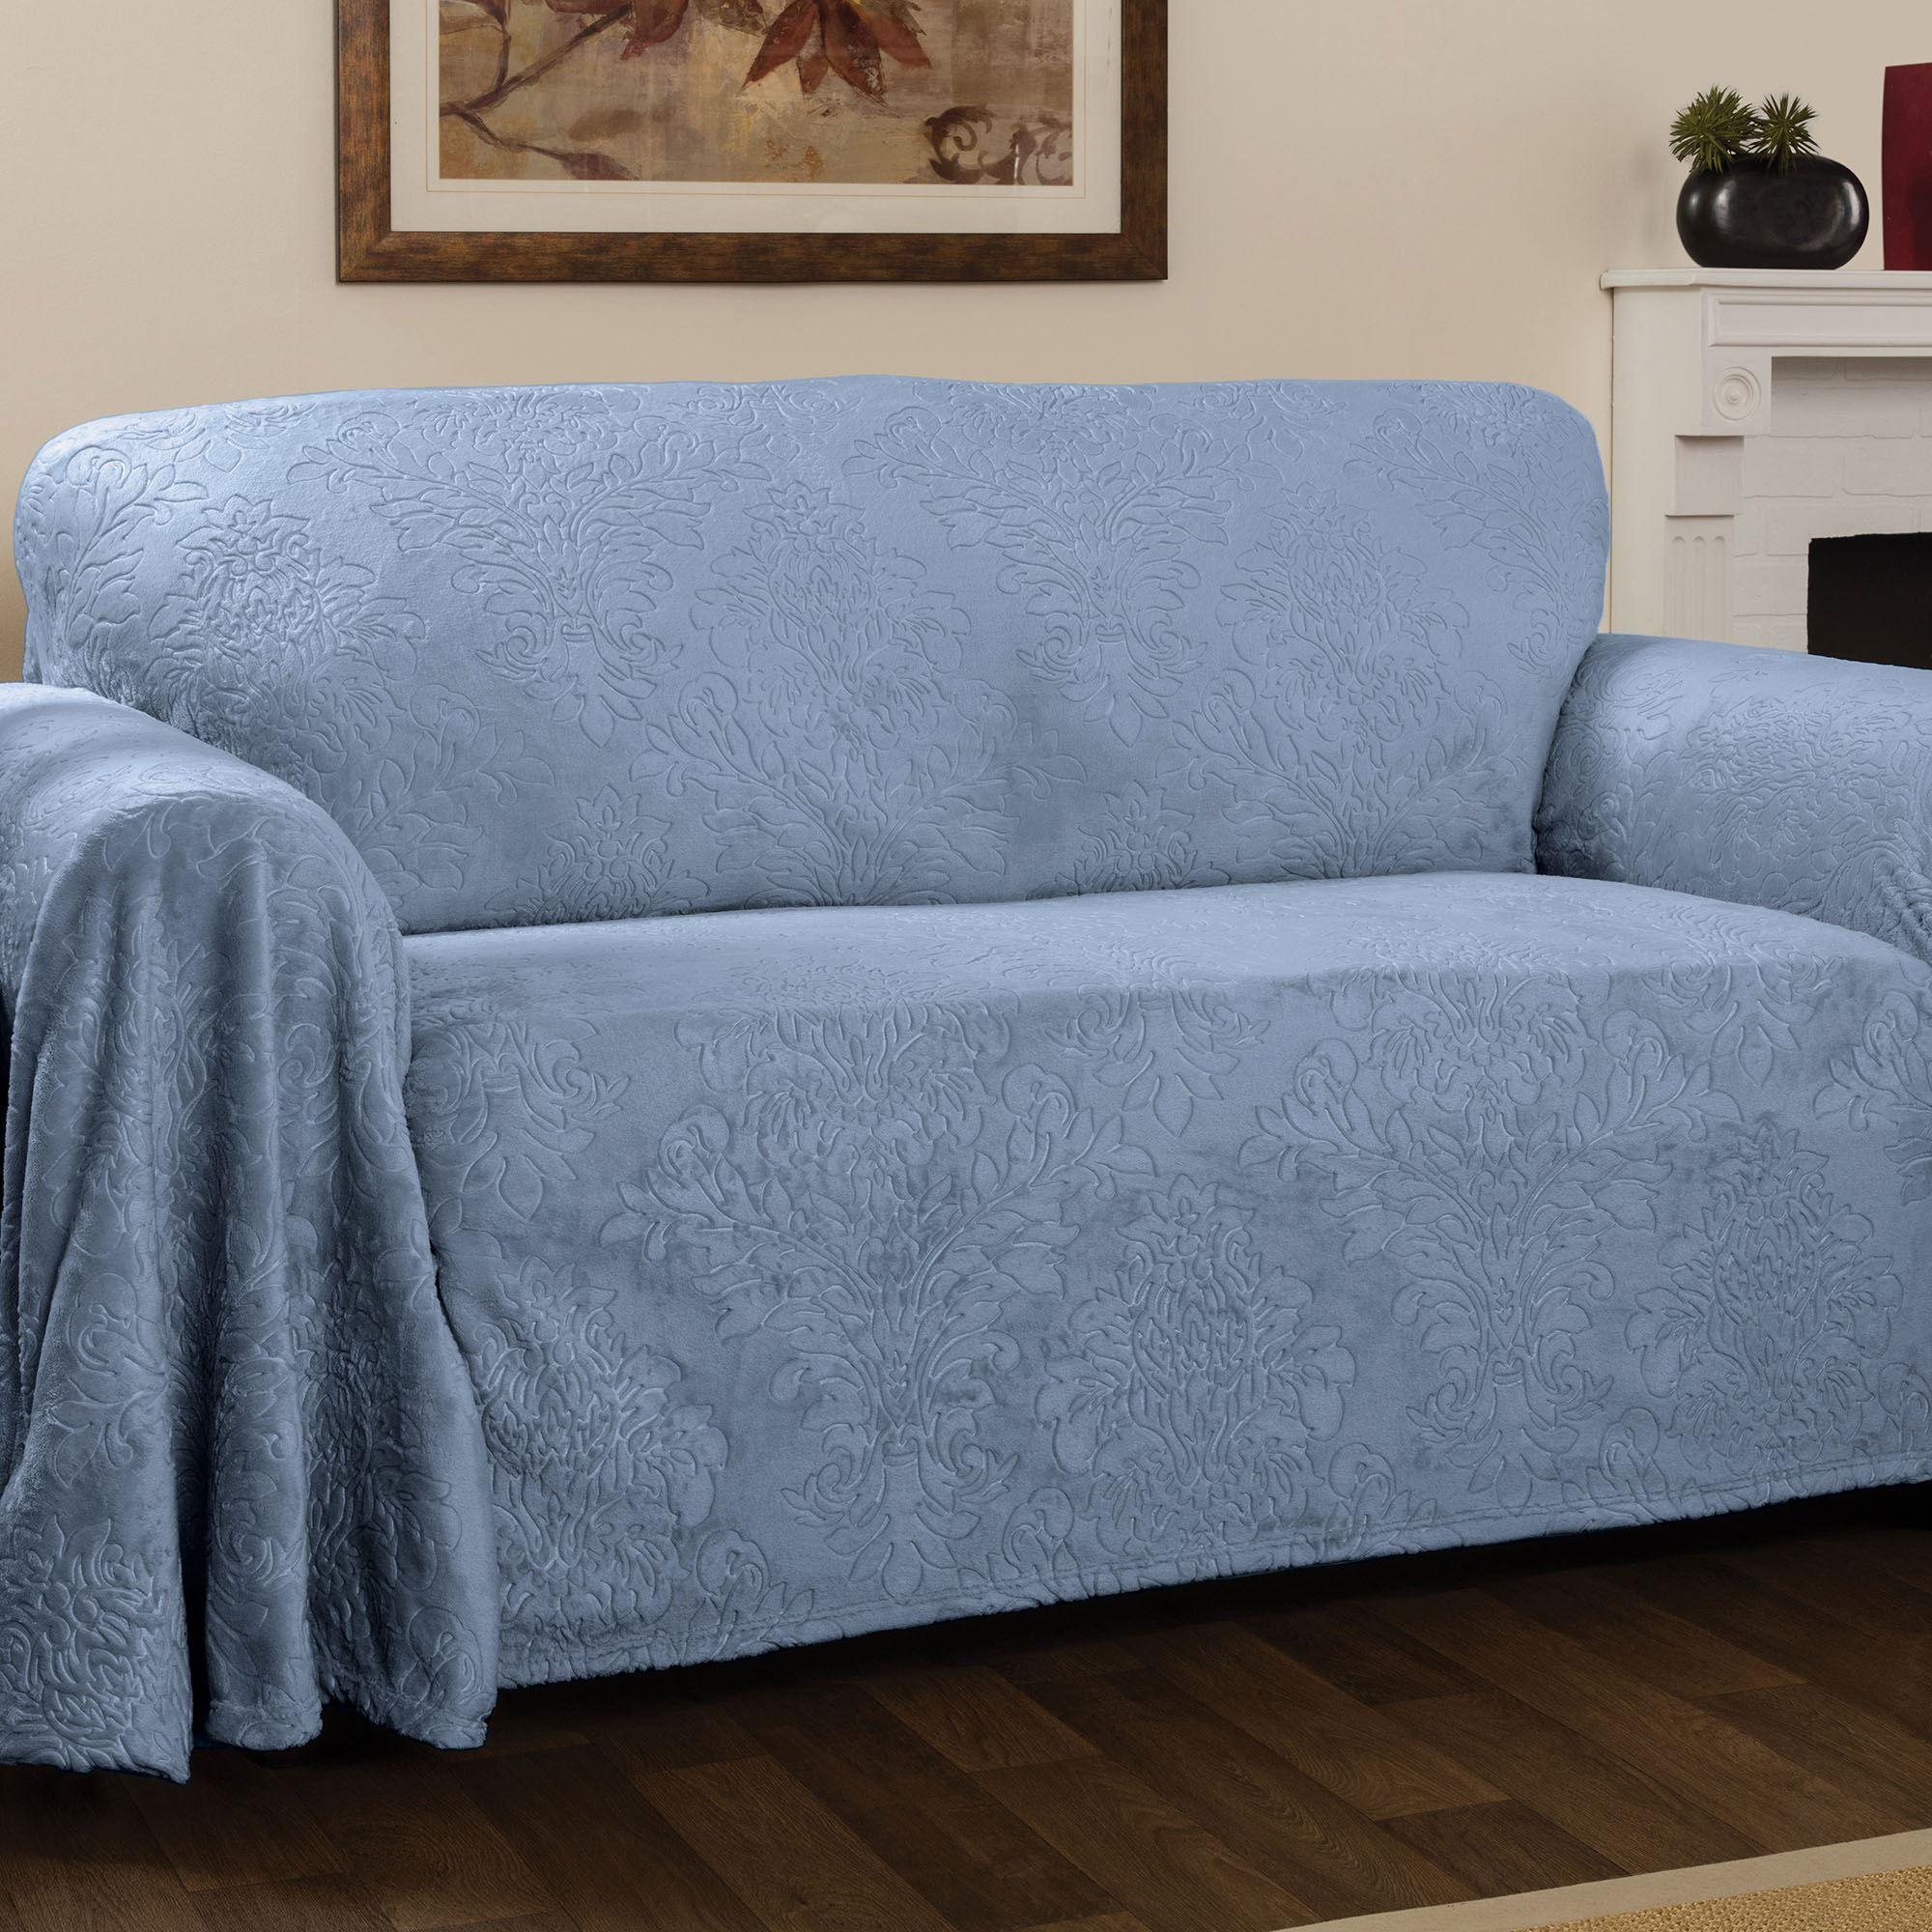 Elegant Damask Cerulean Blue Drapable Furniture Covers